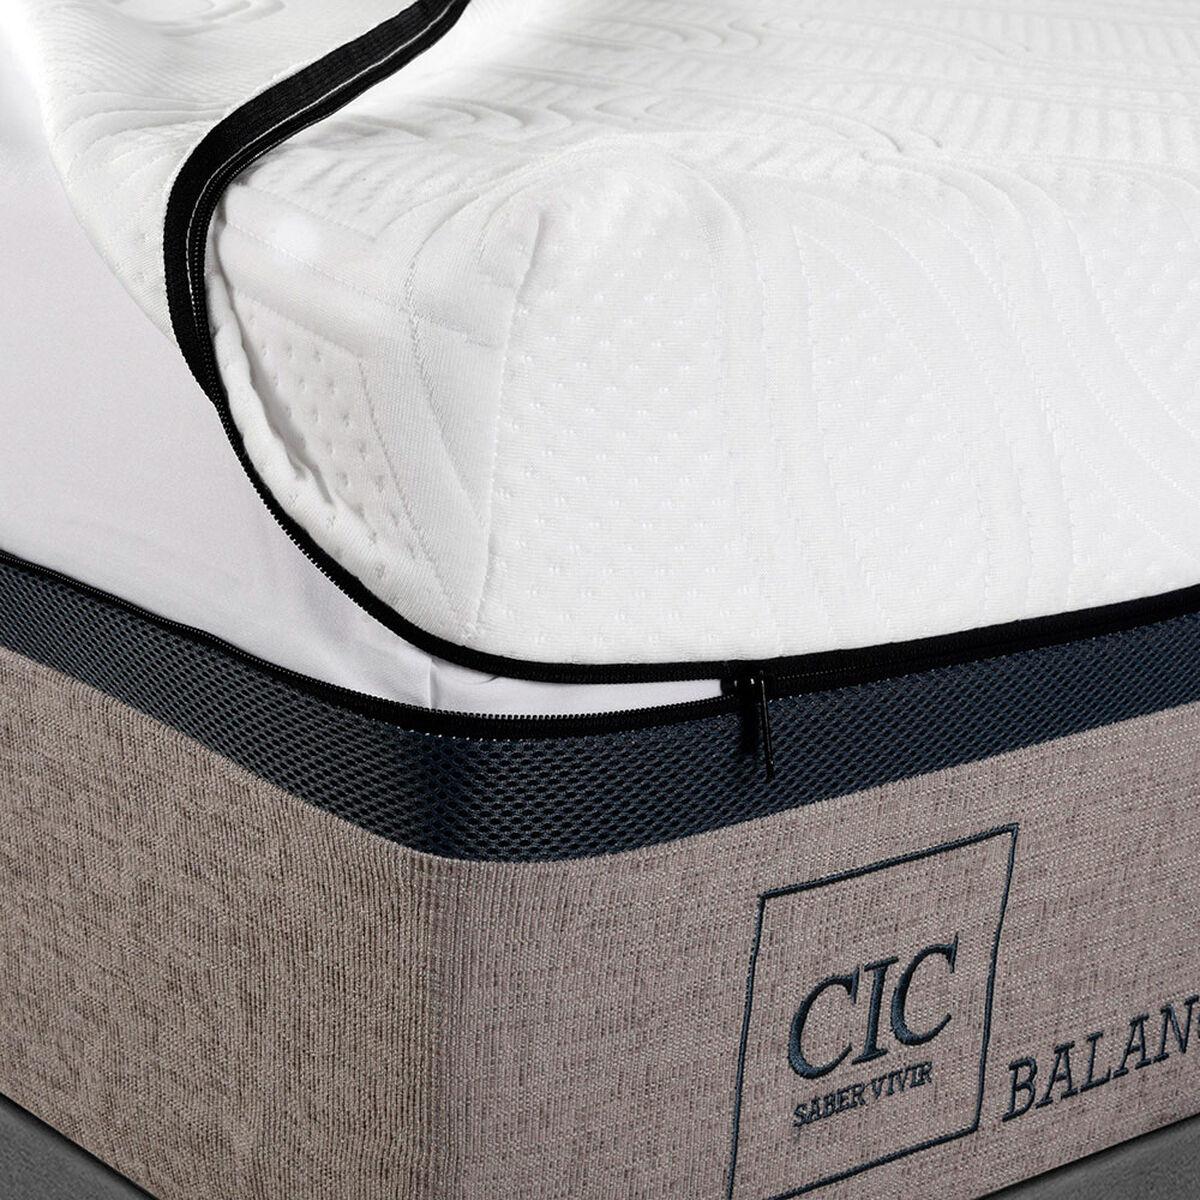 Cama Europea 2 Plazas Div Balance + Textil + Almohadas